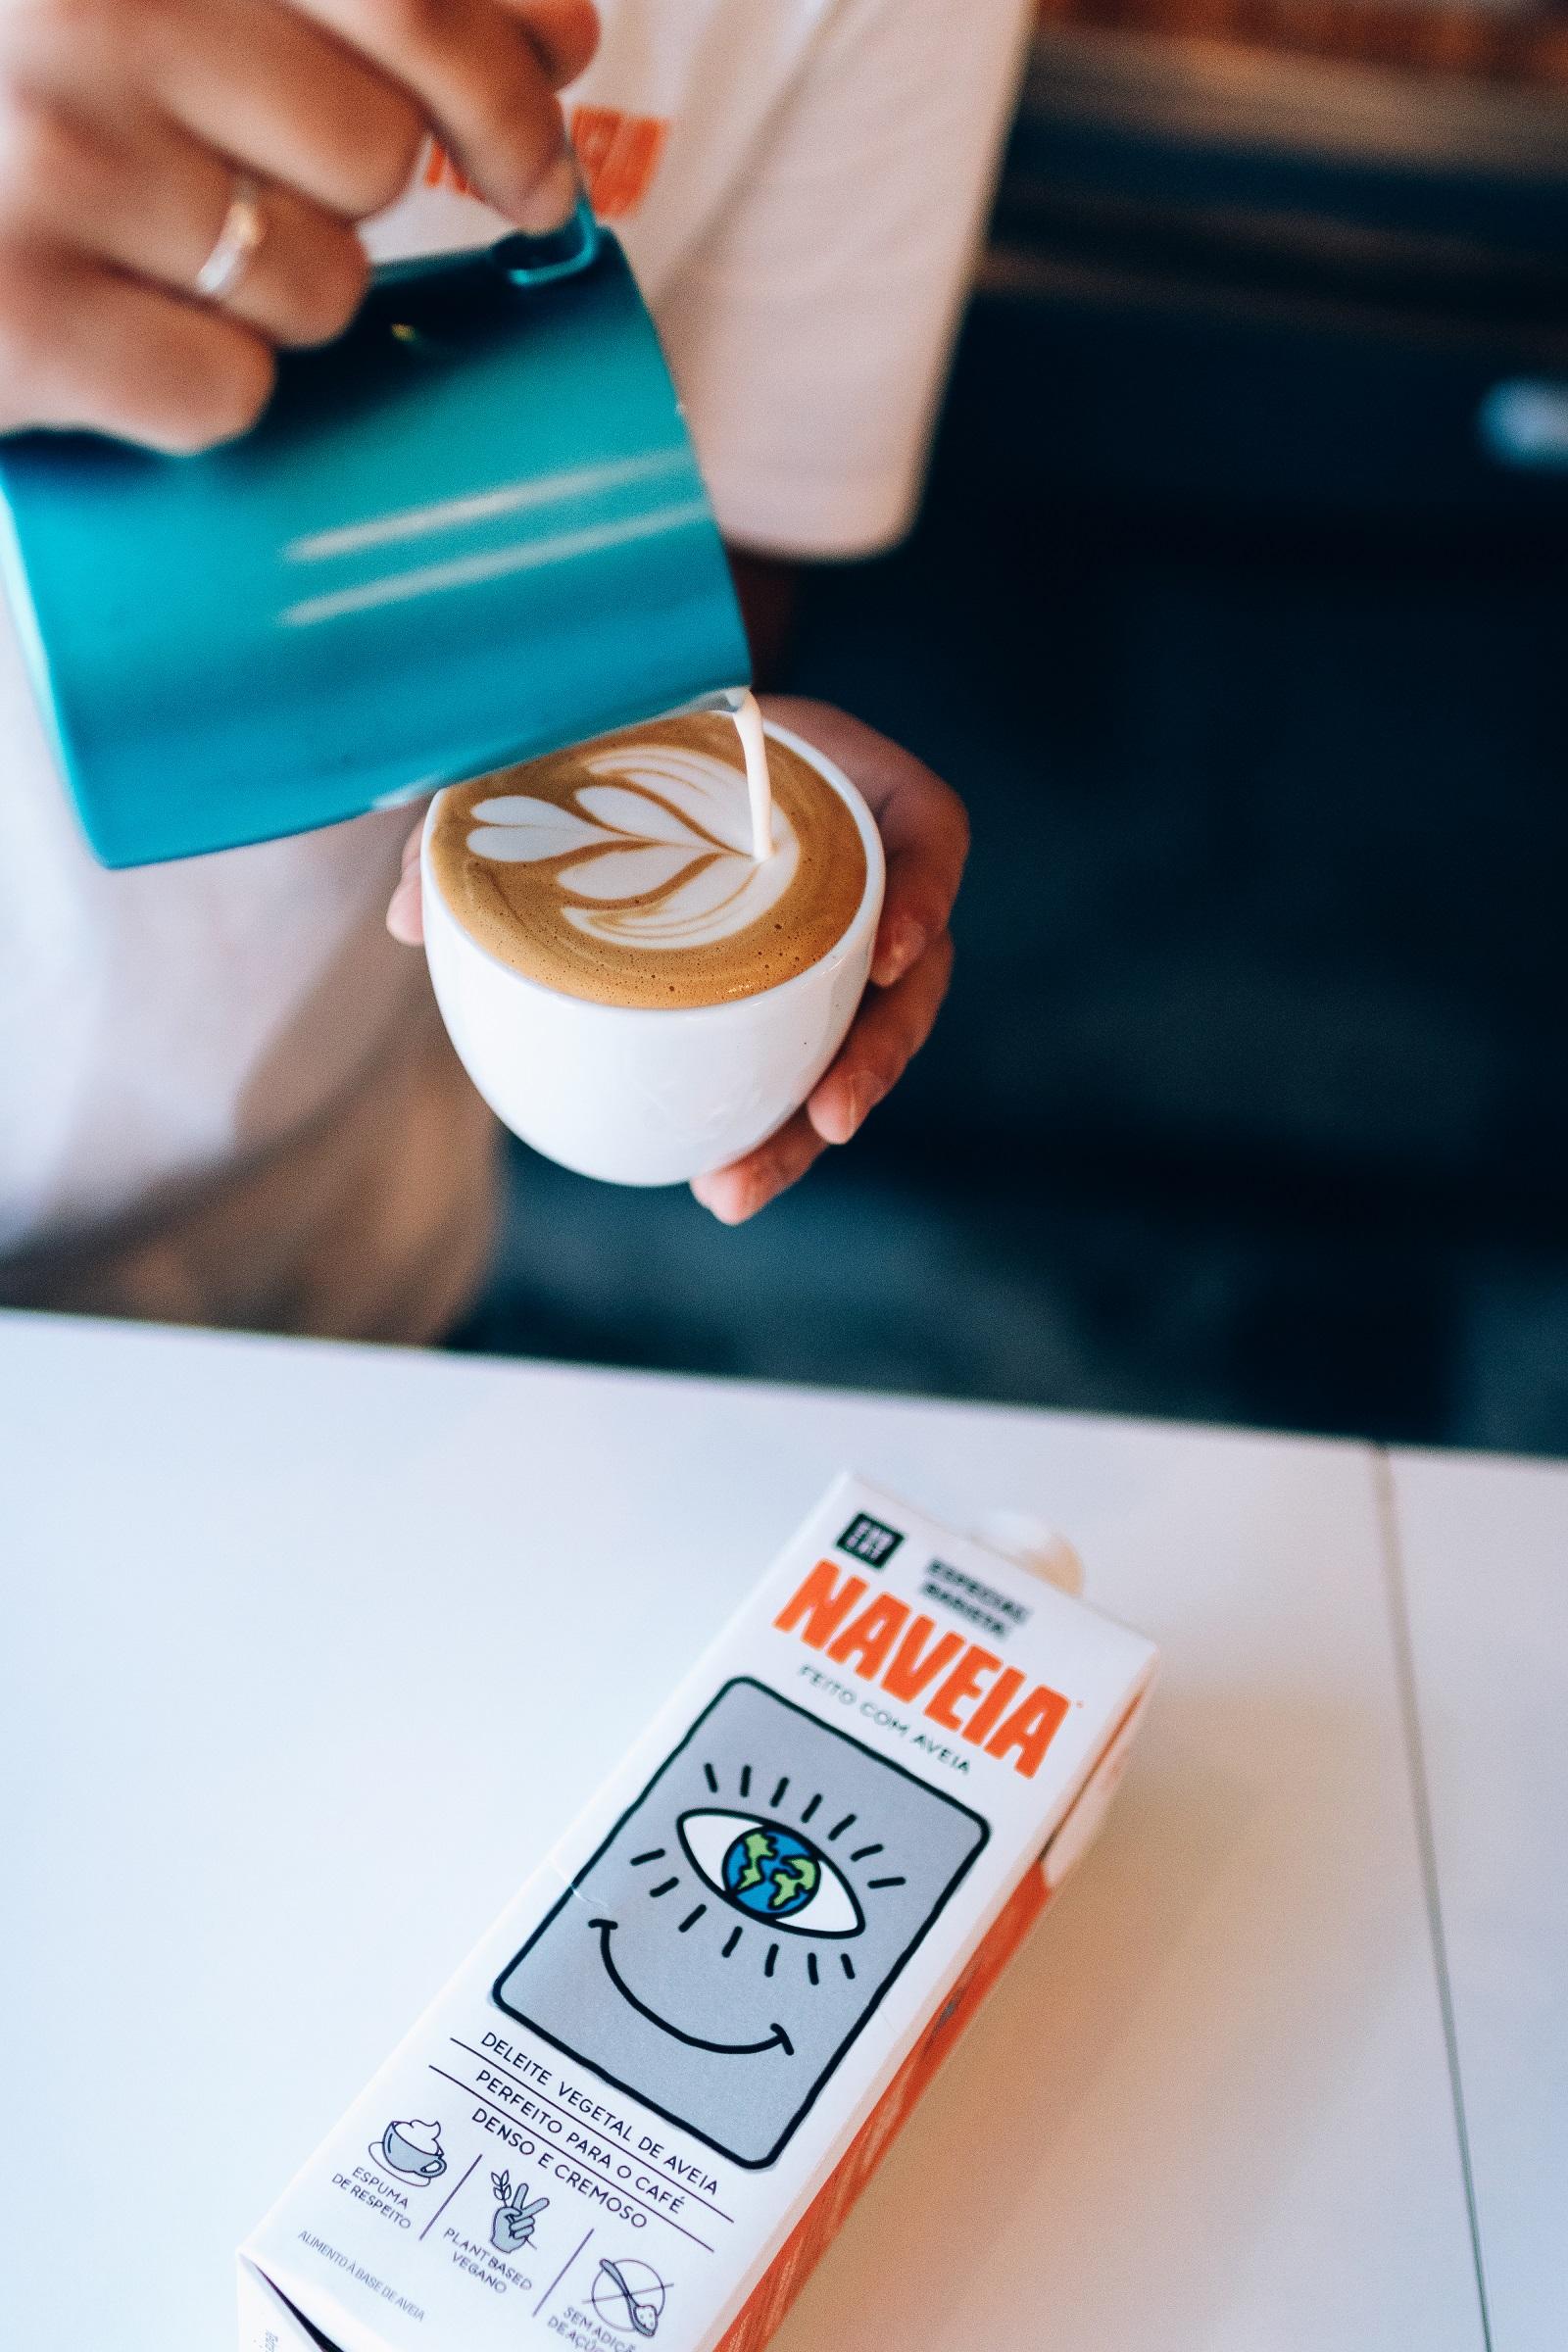 Naveia-Barista_latte-art-4_credito-divulgacao